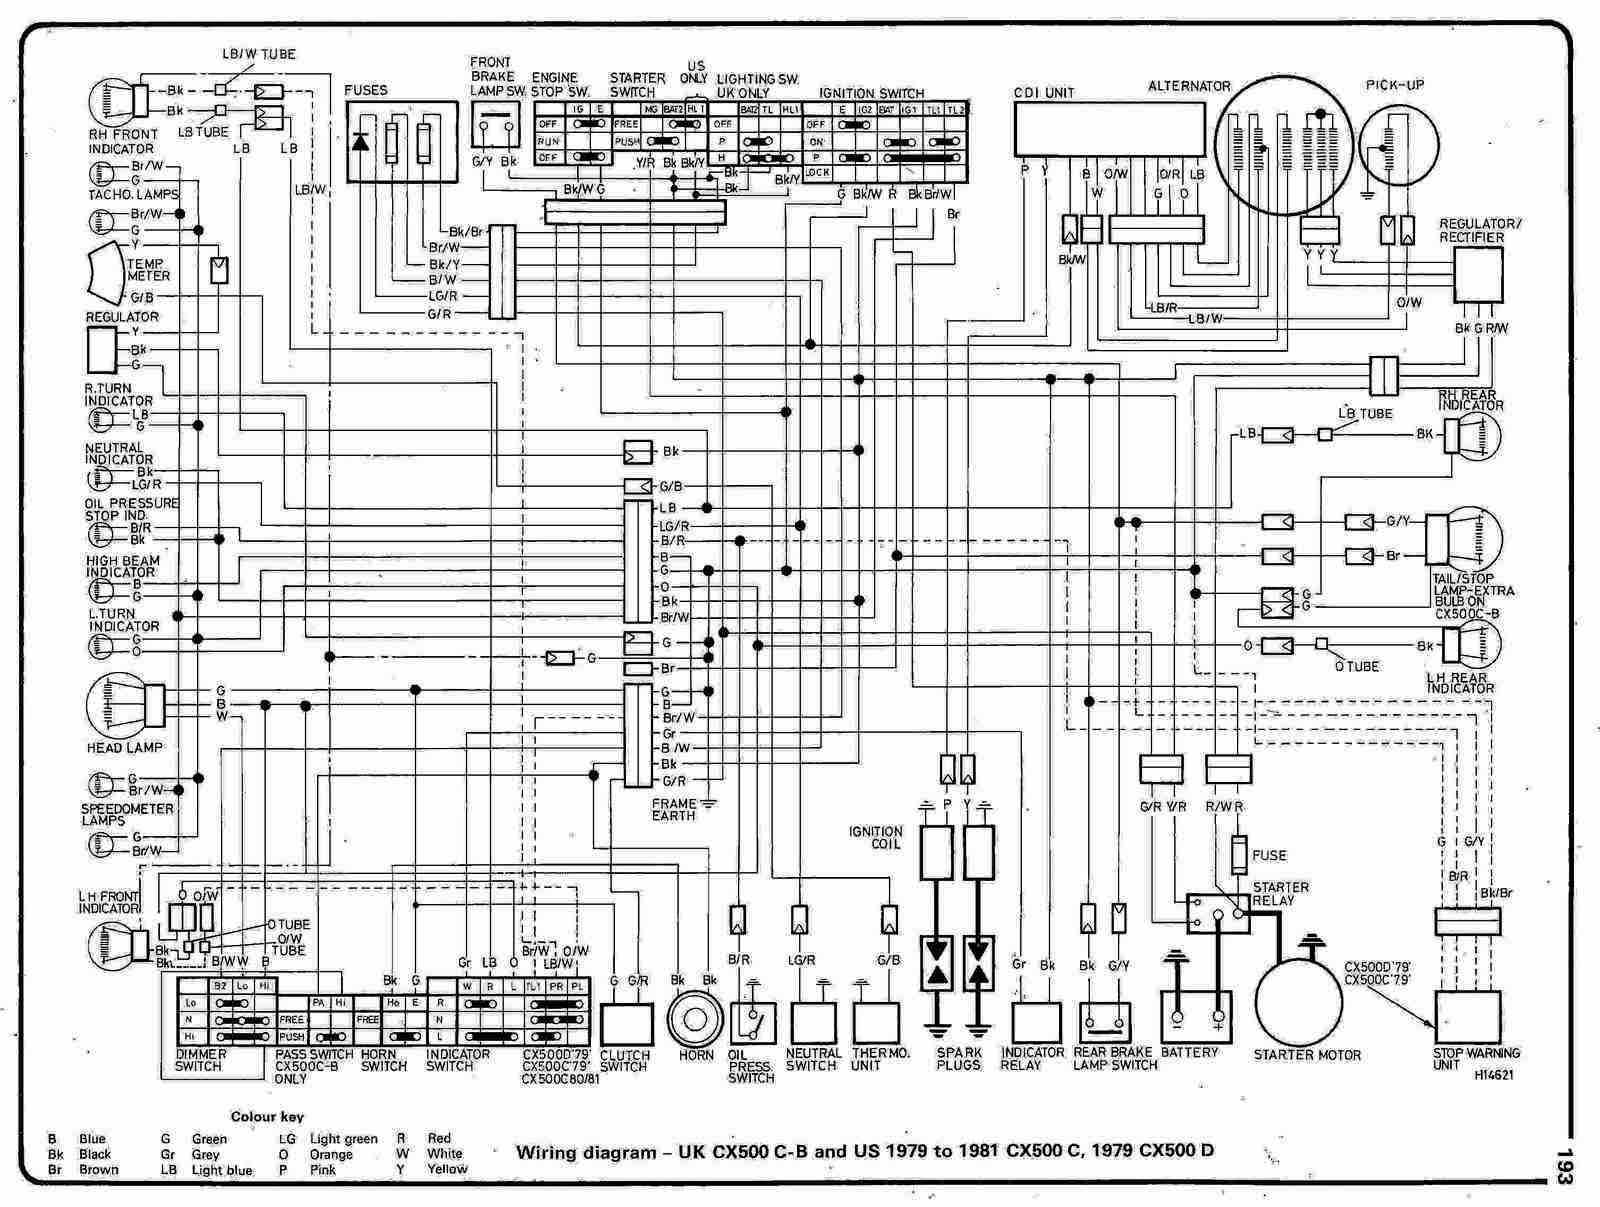 1973 Honda Cb550 Wiring Diagram Schematic Diagrams 1975 360 Cb 500 1979 Wire Data Schema U2022